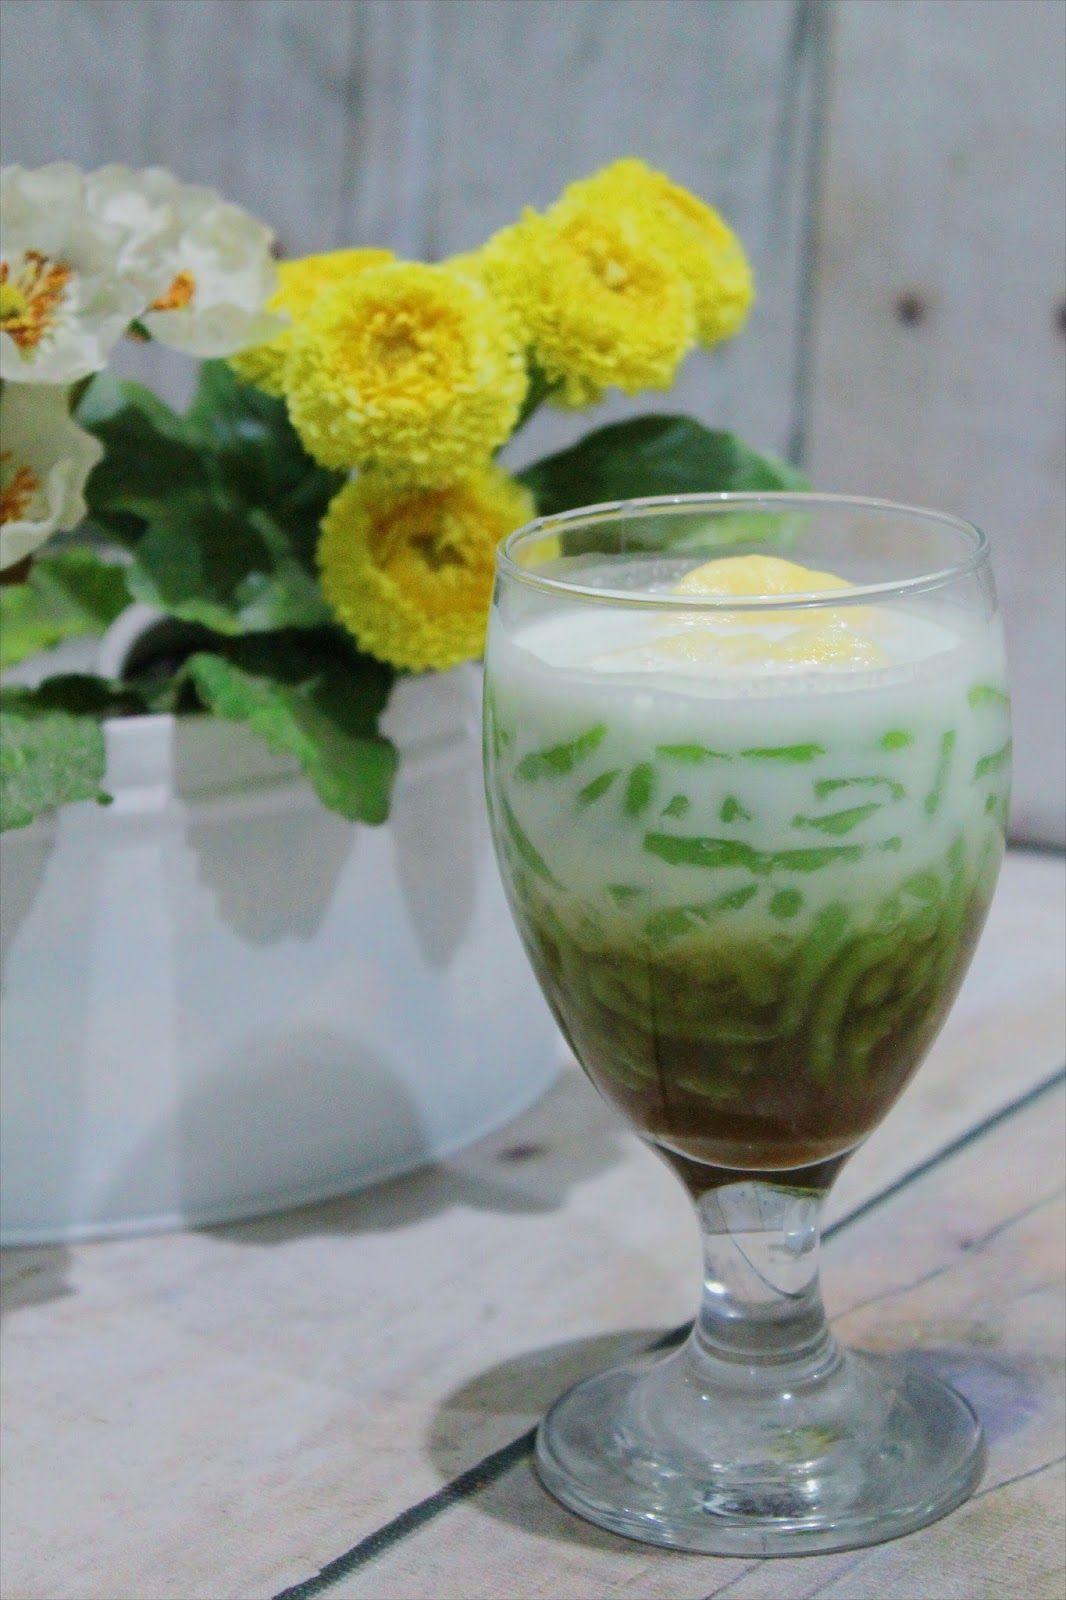 Resep Dawet Ayu Dawet Ayu Jadul Hidangan Takjil Minuman Tradisional Indonesia Perbedaan Dawet Dan Cendol Resep Minuman